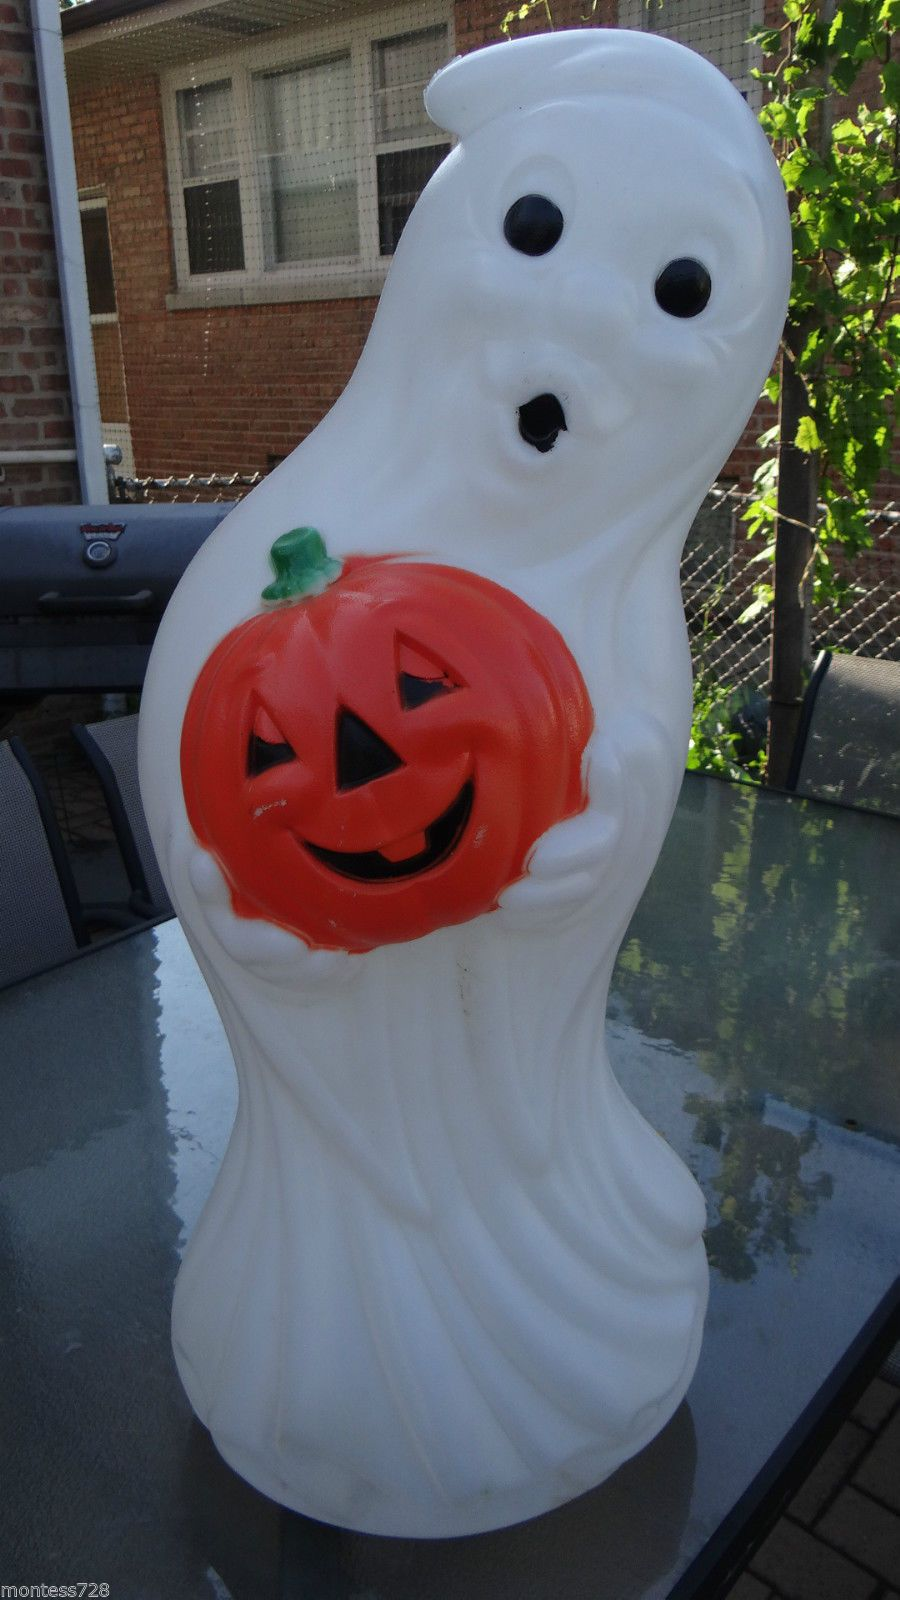 34 Quot Ghost Holding Pumpkin Lighted Halloween Blow Mold